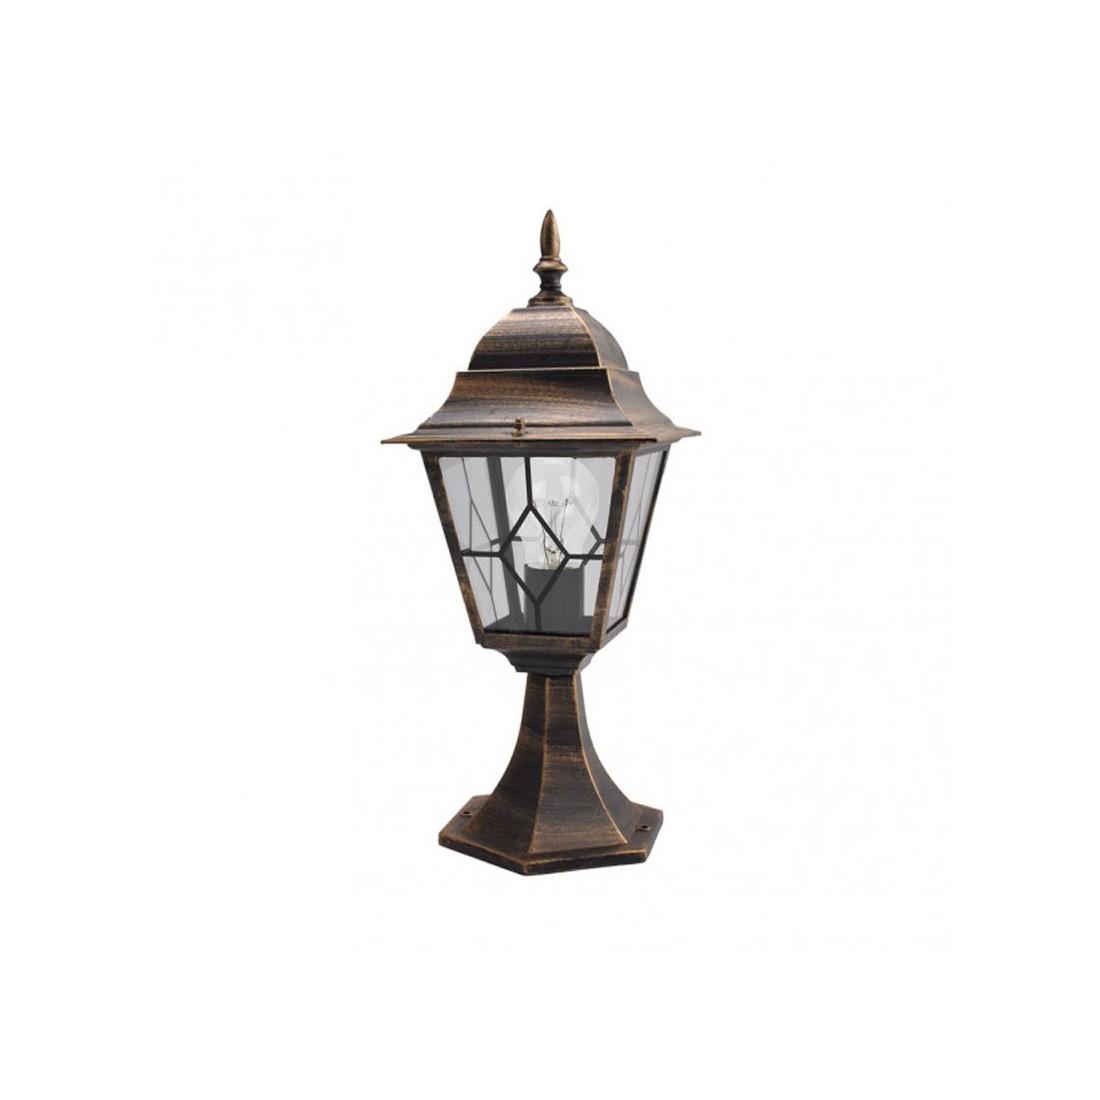 Ofertas de luces de exterior baratos online env o r pido - Lamparas de pared exterior ...